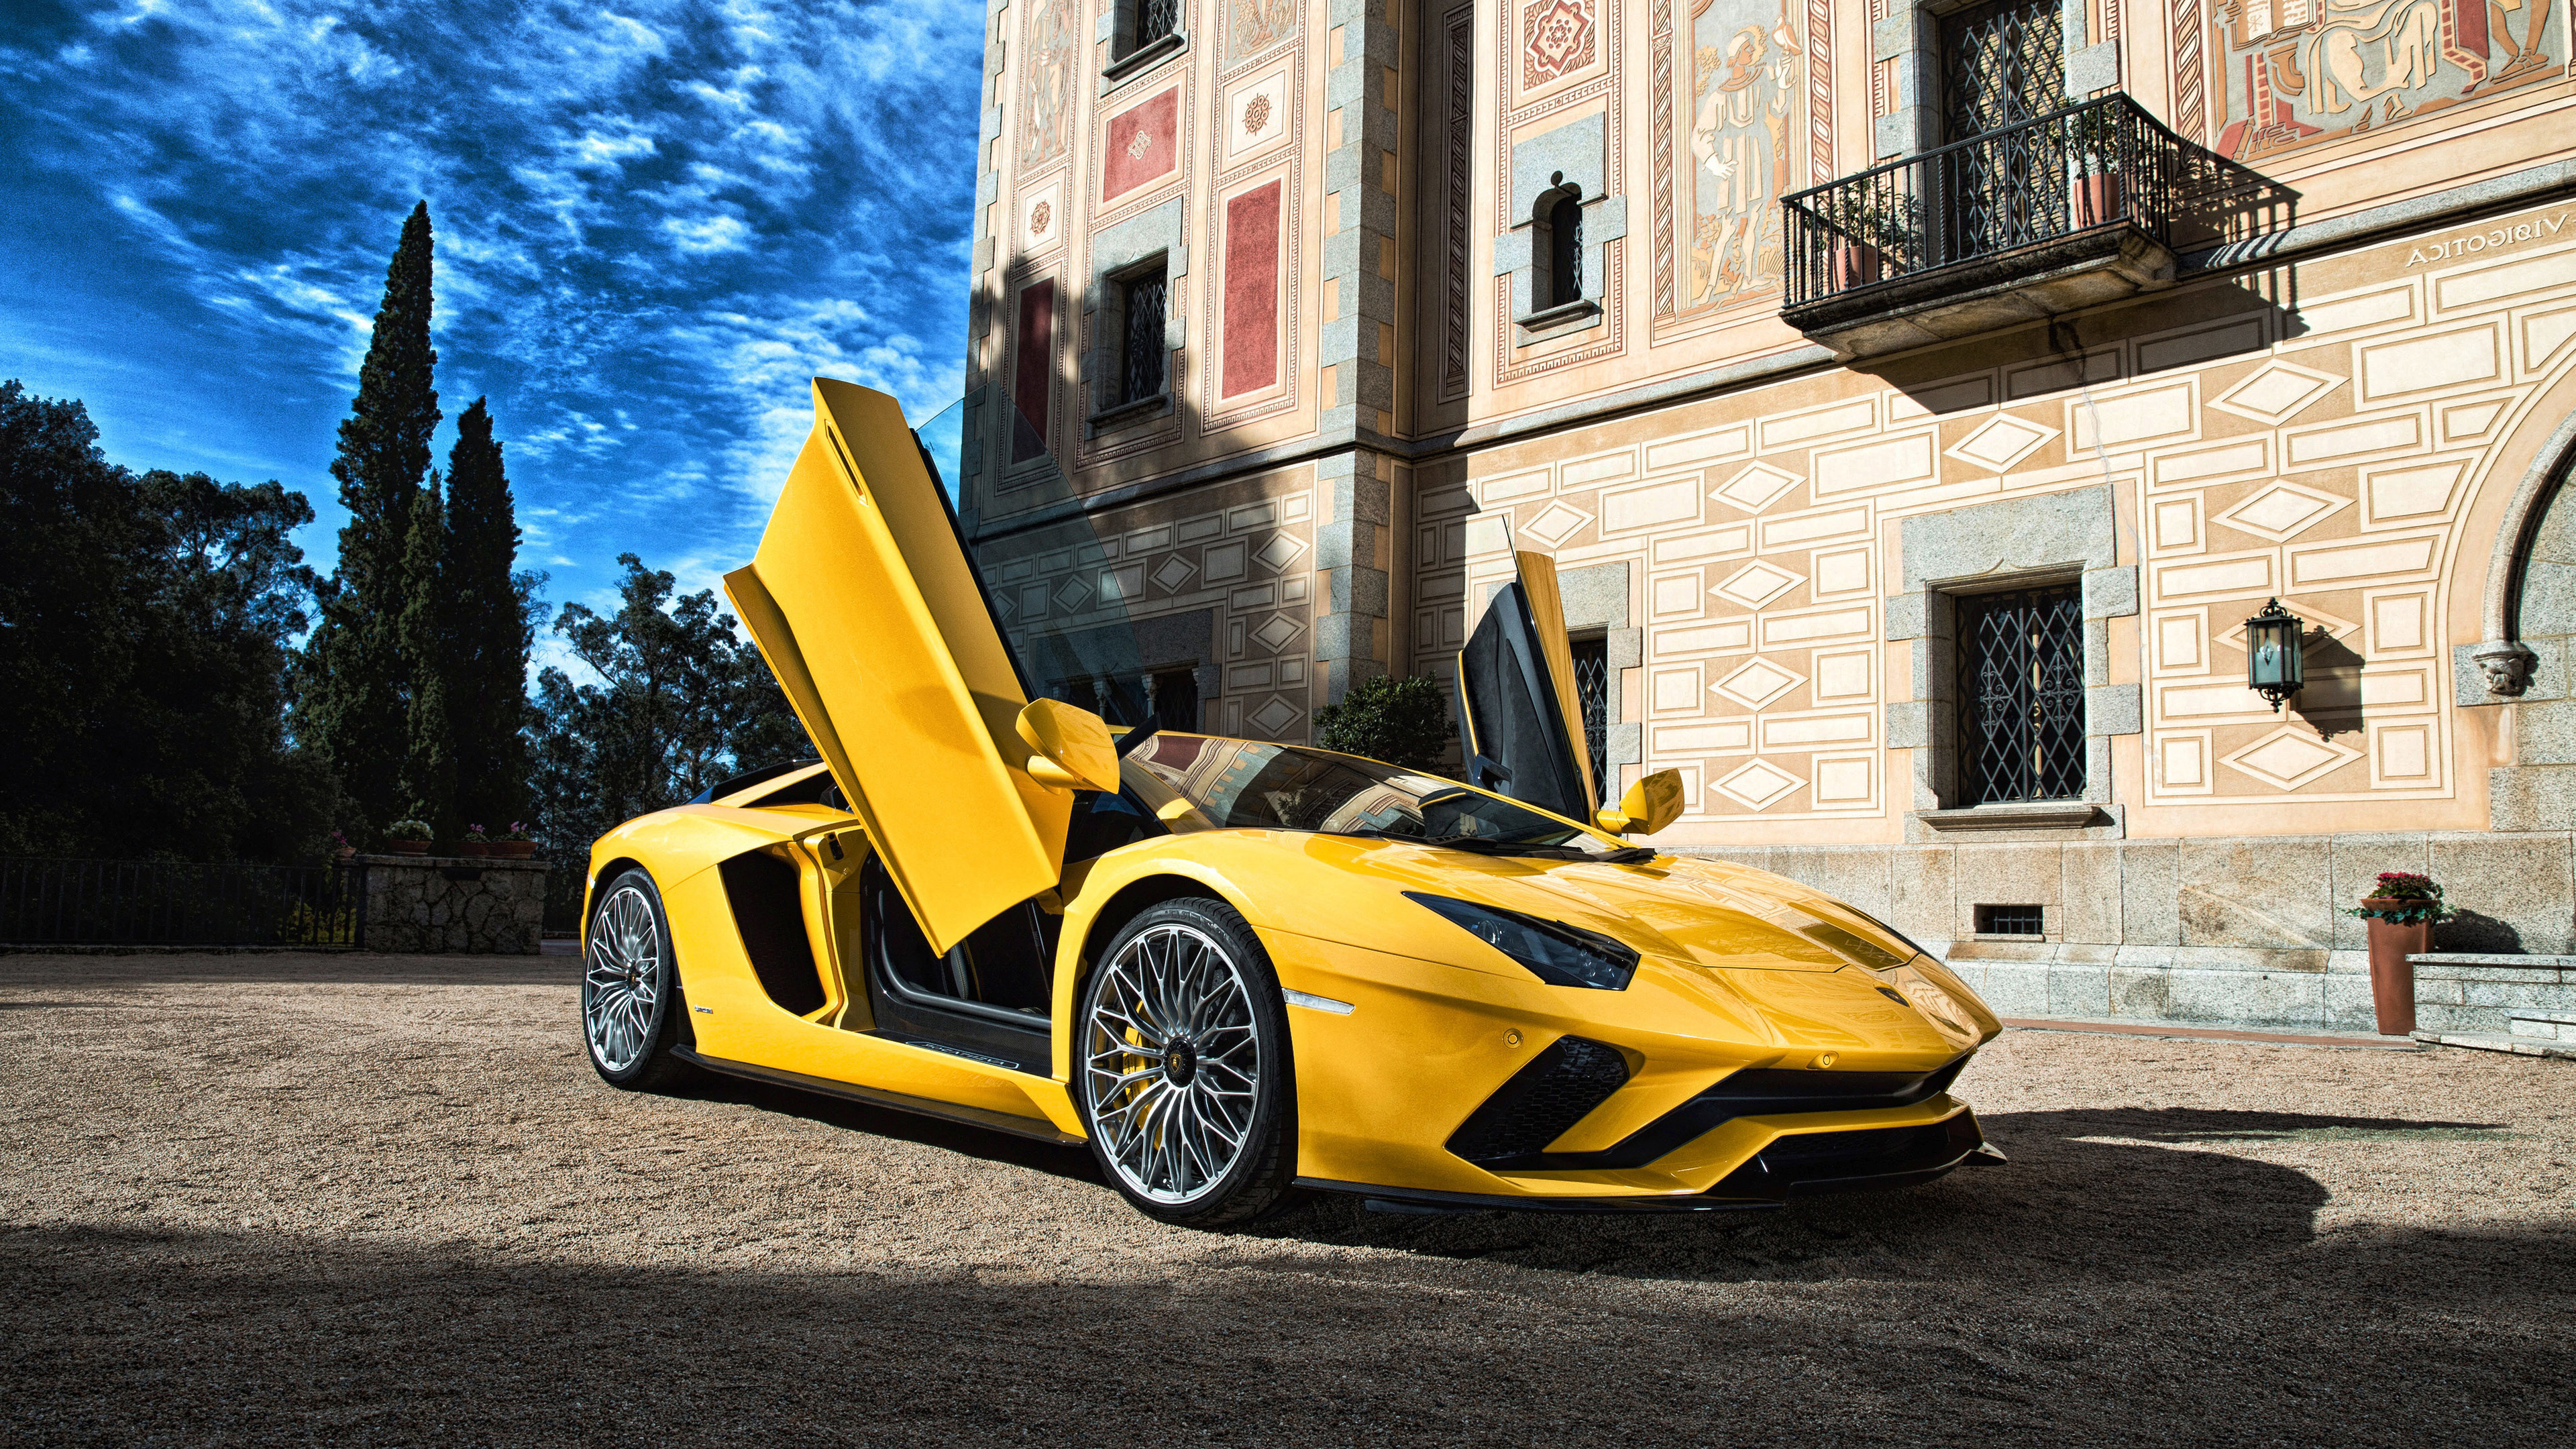 lamborghini aventador 5k 4k 1539105114 - Lamborghini Aventador 5k 4k - yellow wallpapers, lamborghini wallpapers, lamborghini aventador wallpapers, hd-wallpapers, cars wallpapers, 5k wallpapers, 4k-wallpapers